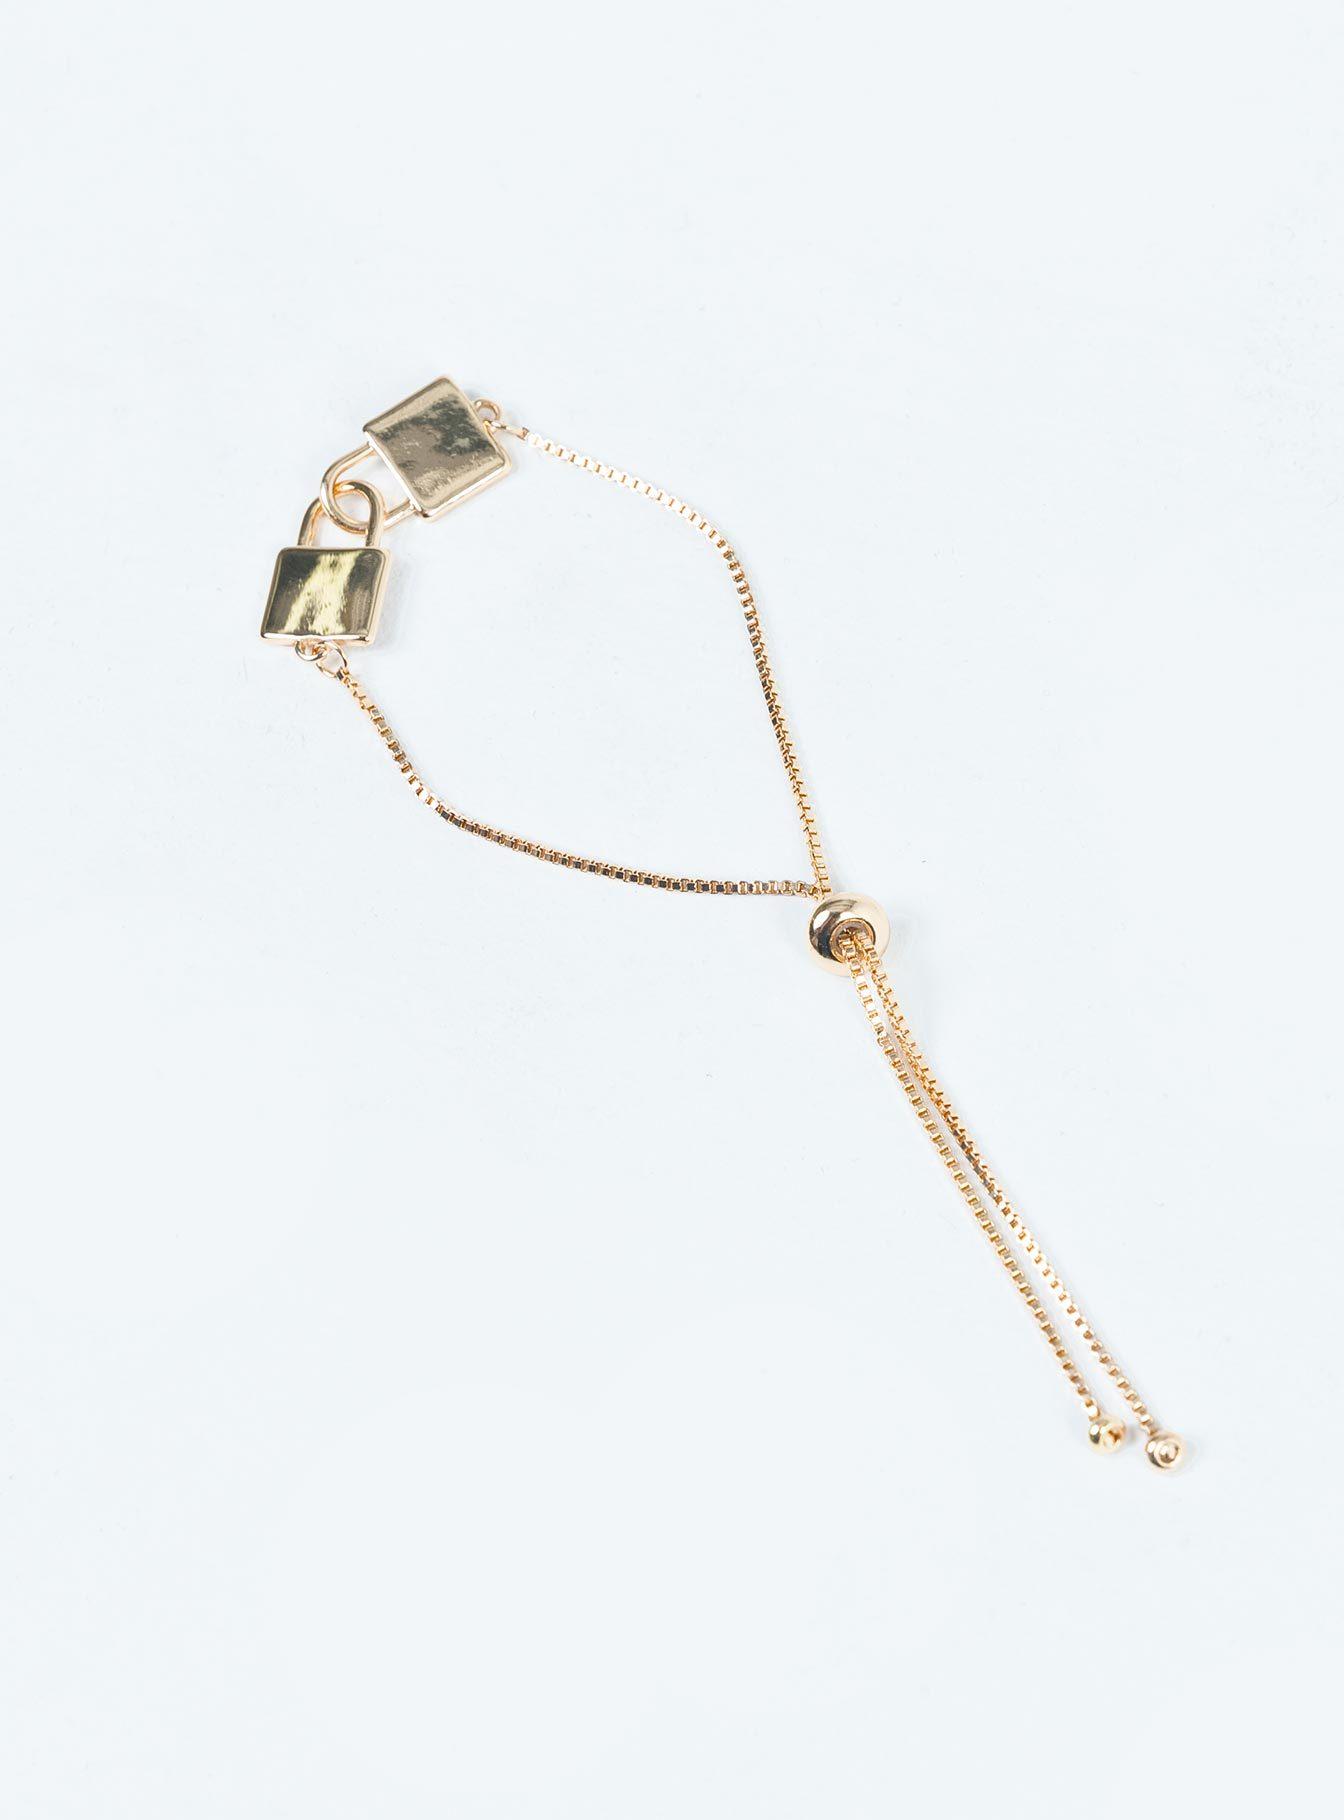 Bracelets & Anklets (Side B)